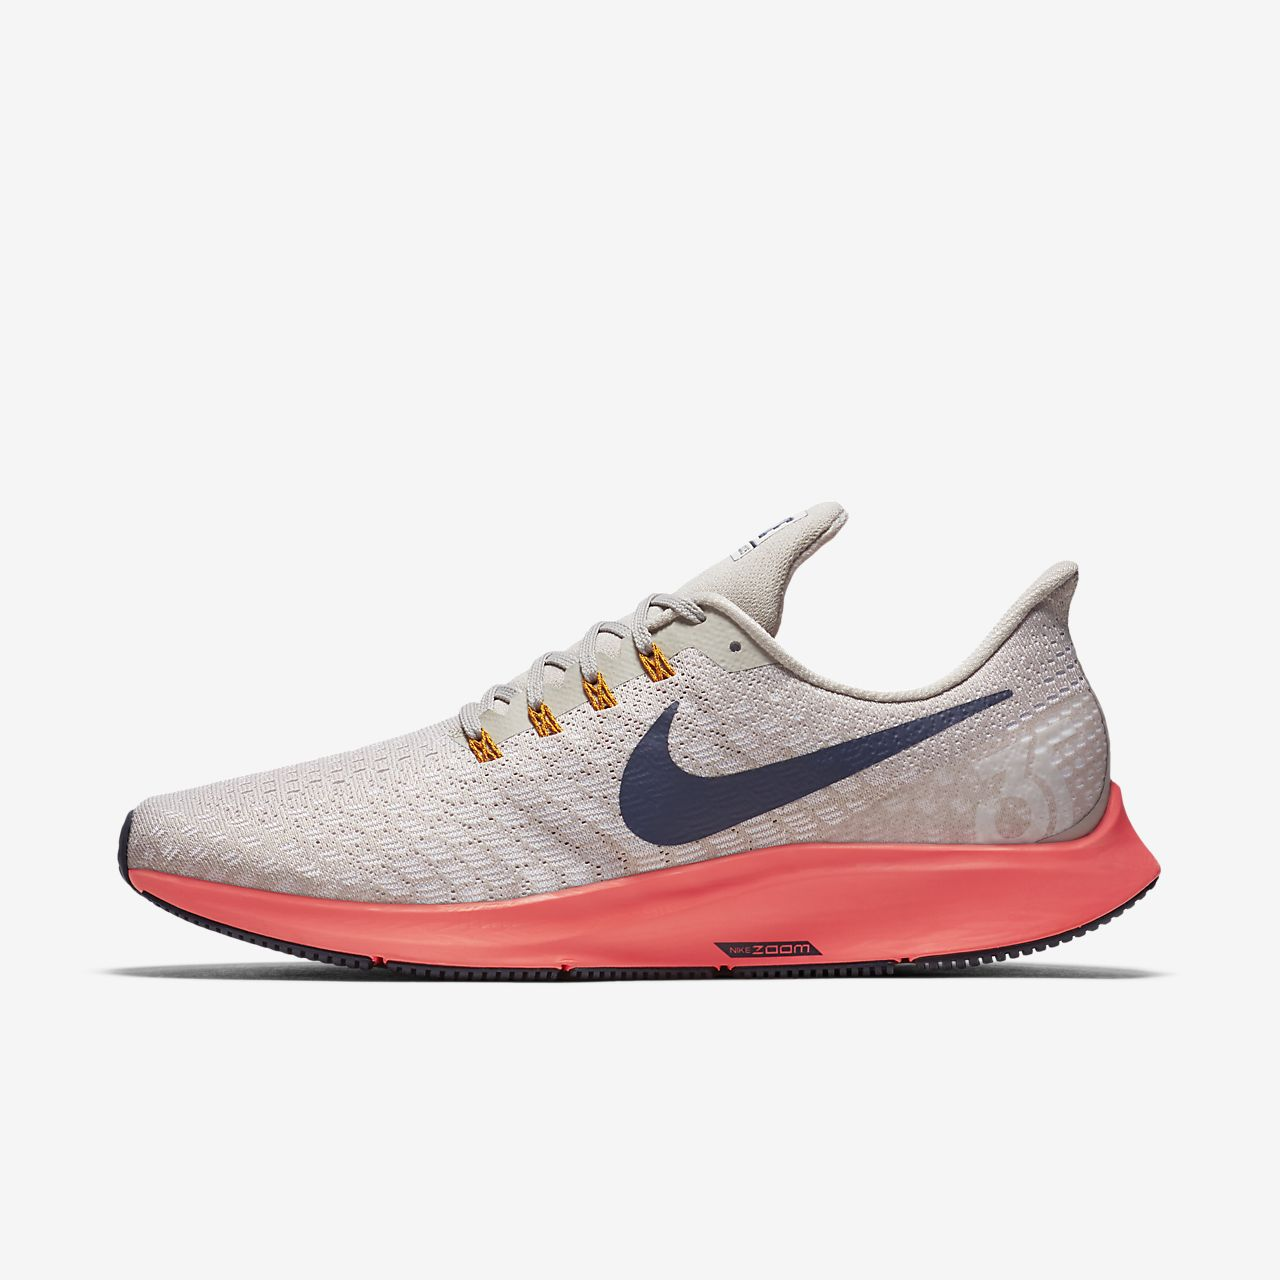 Calzado para de corriendo para Air Calzado hombre Nike Air para Zoom Pegasus 35 9389f1